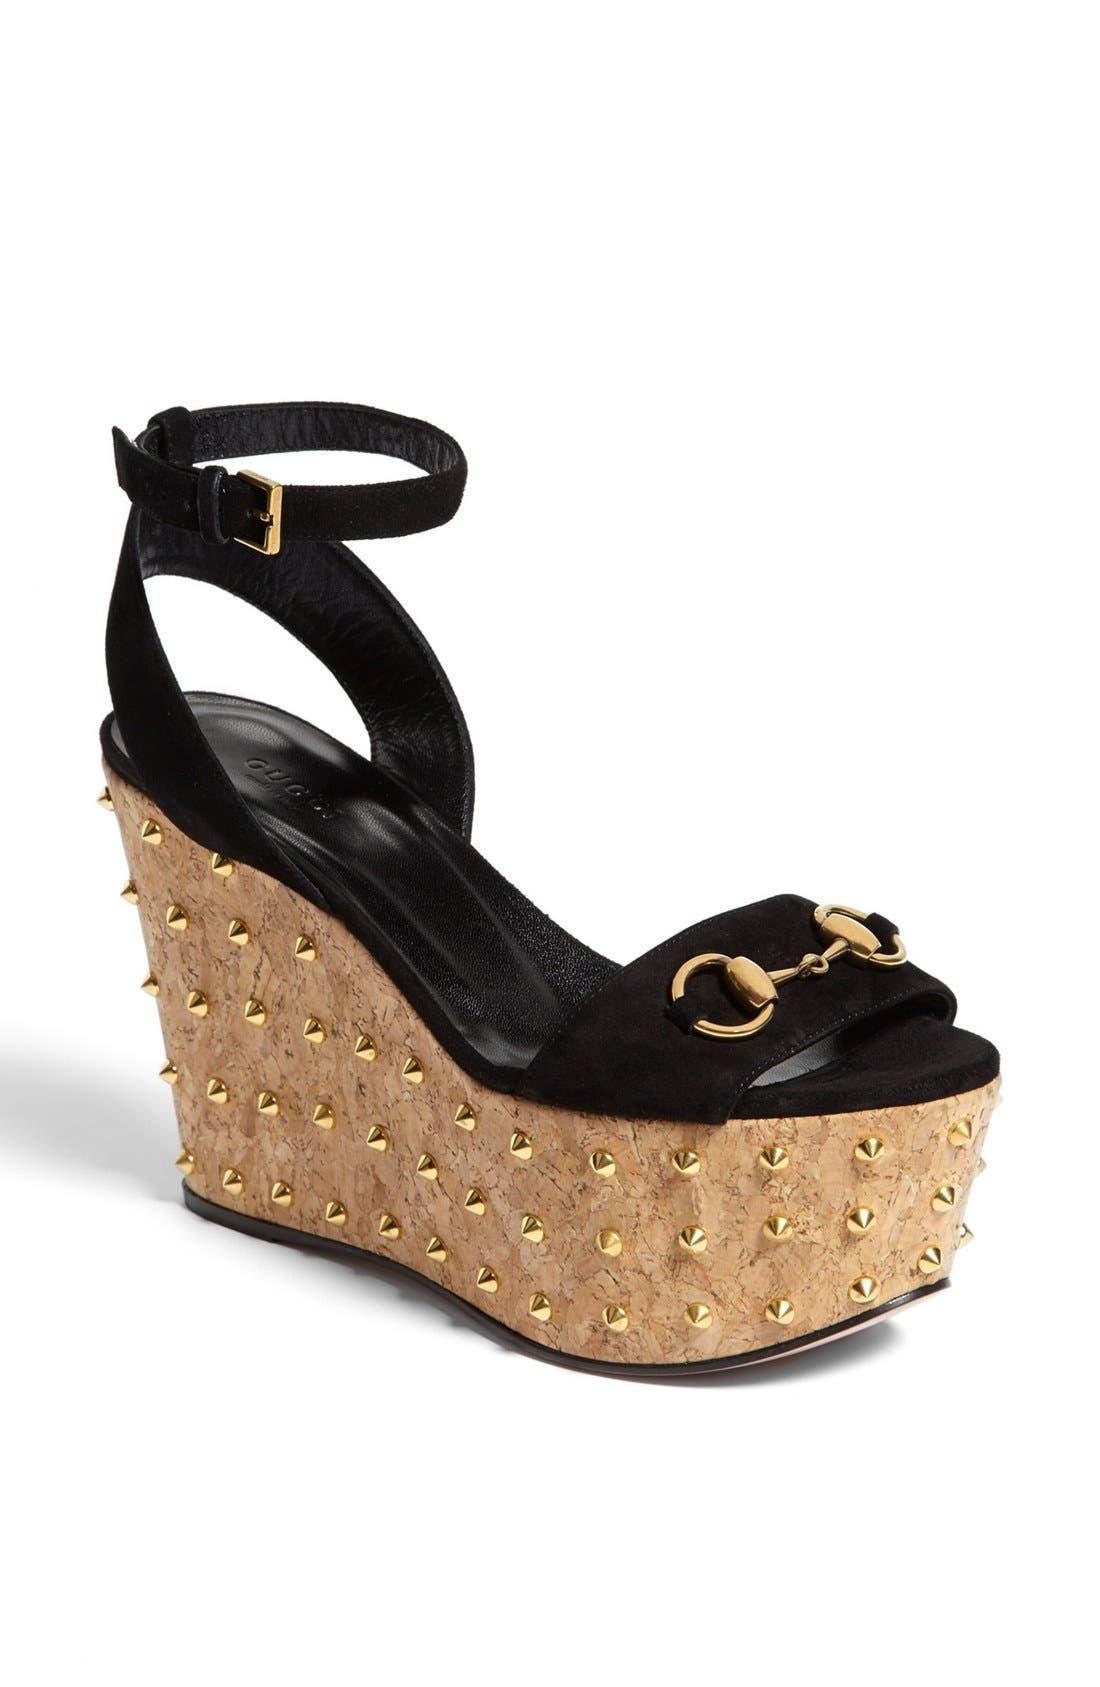 Main Image - Gucci 'Liliane' Studded Platform Sandal